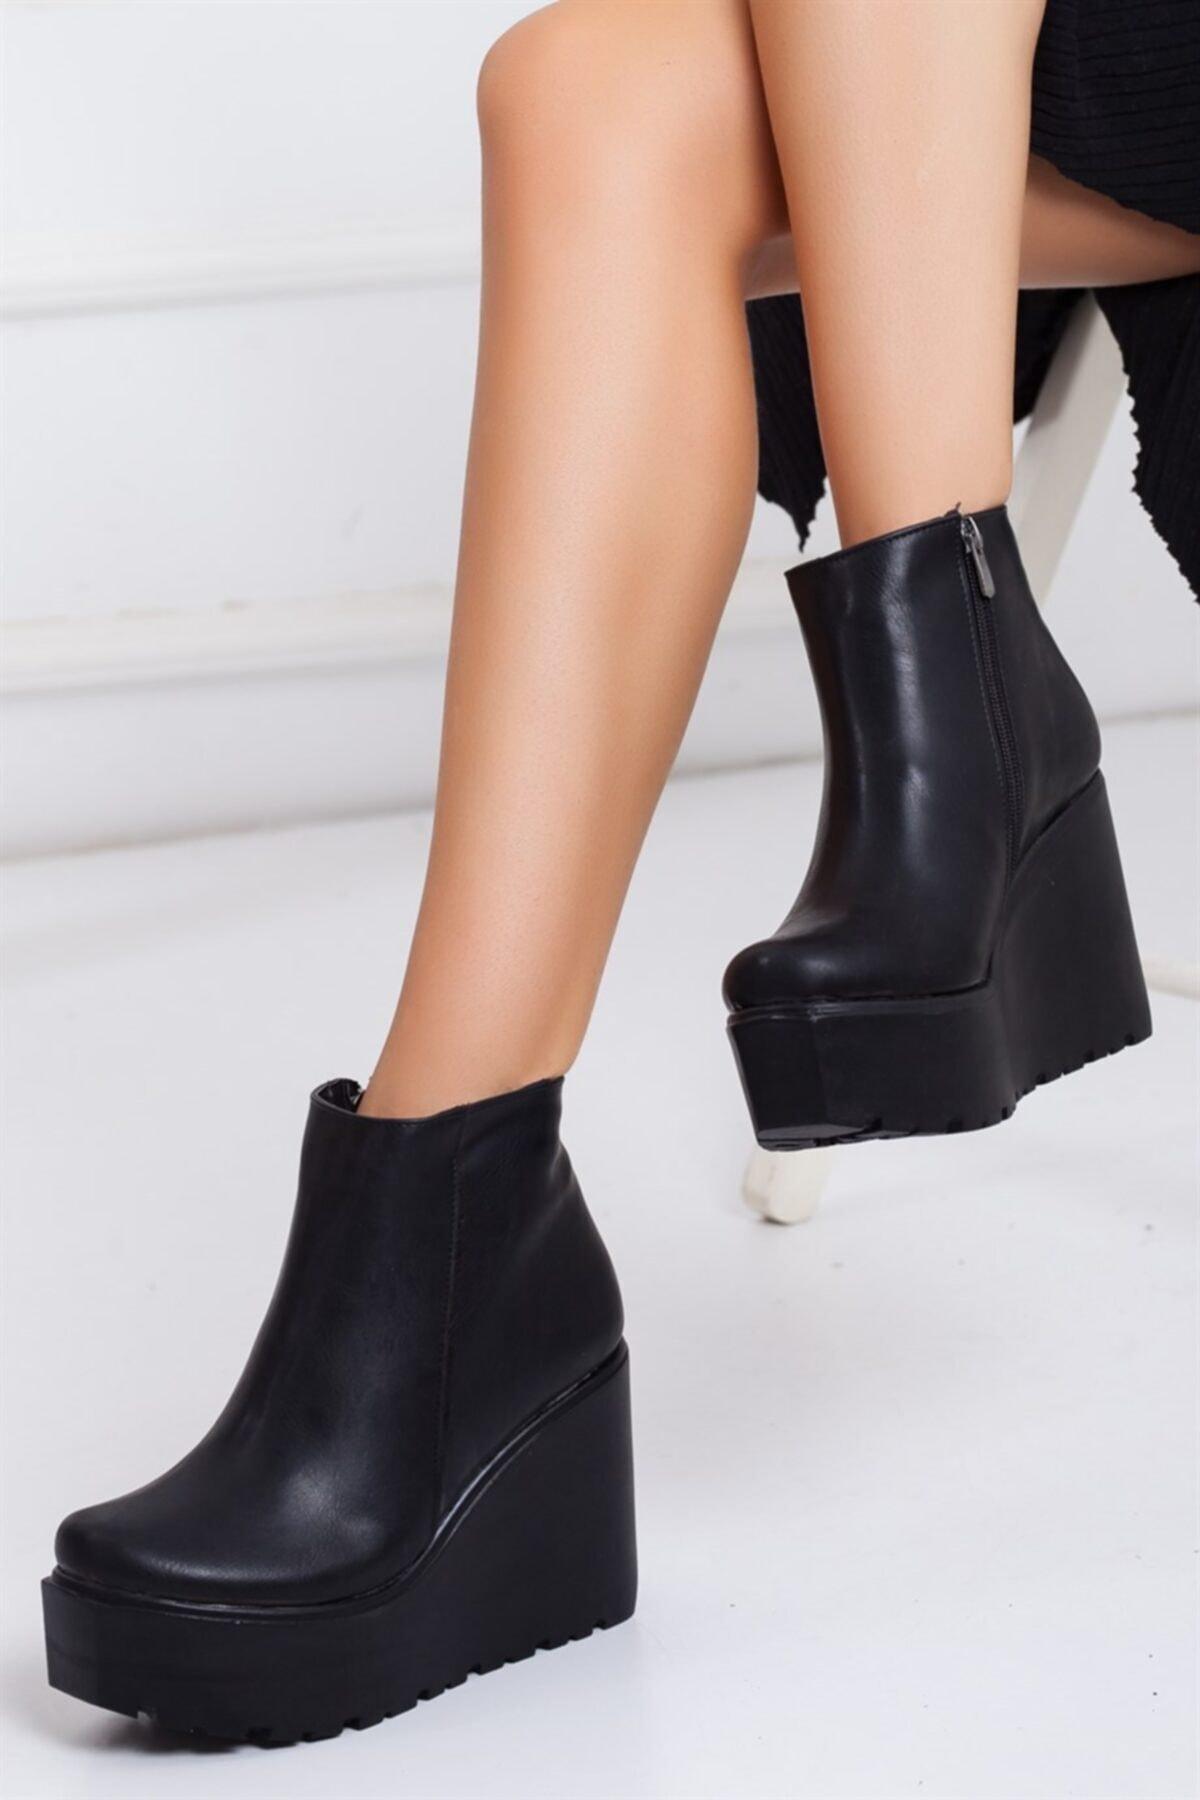 Lovita Shoes Kadın Siyah Dolgu Süet Topuk Bot